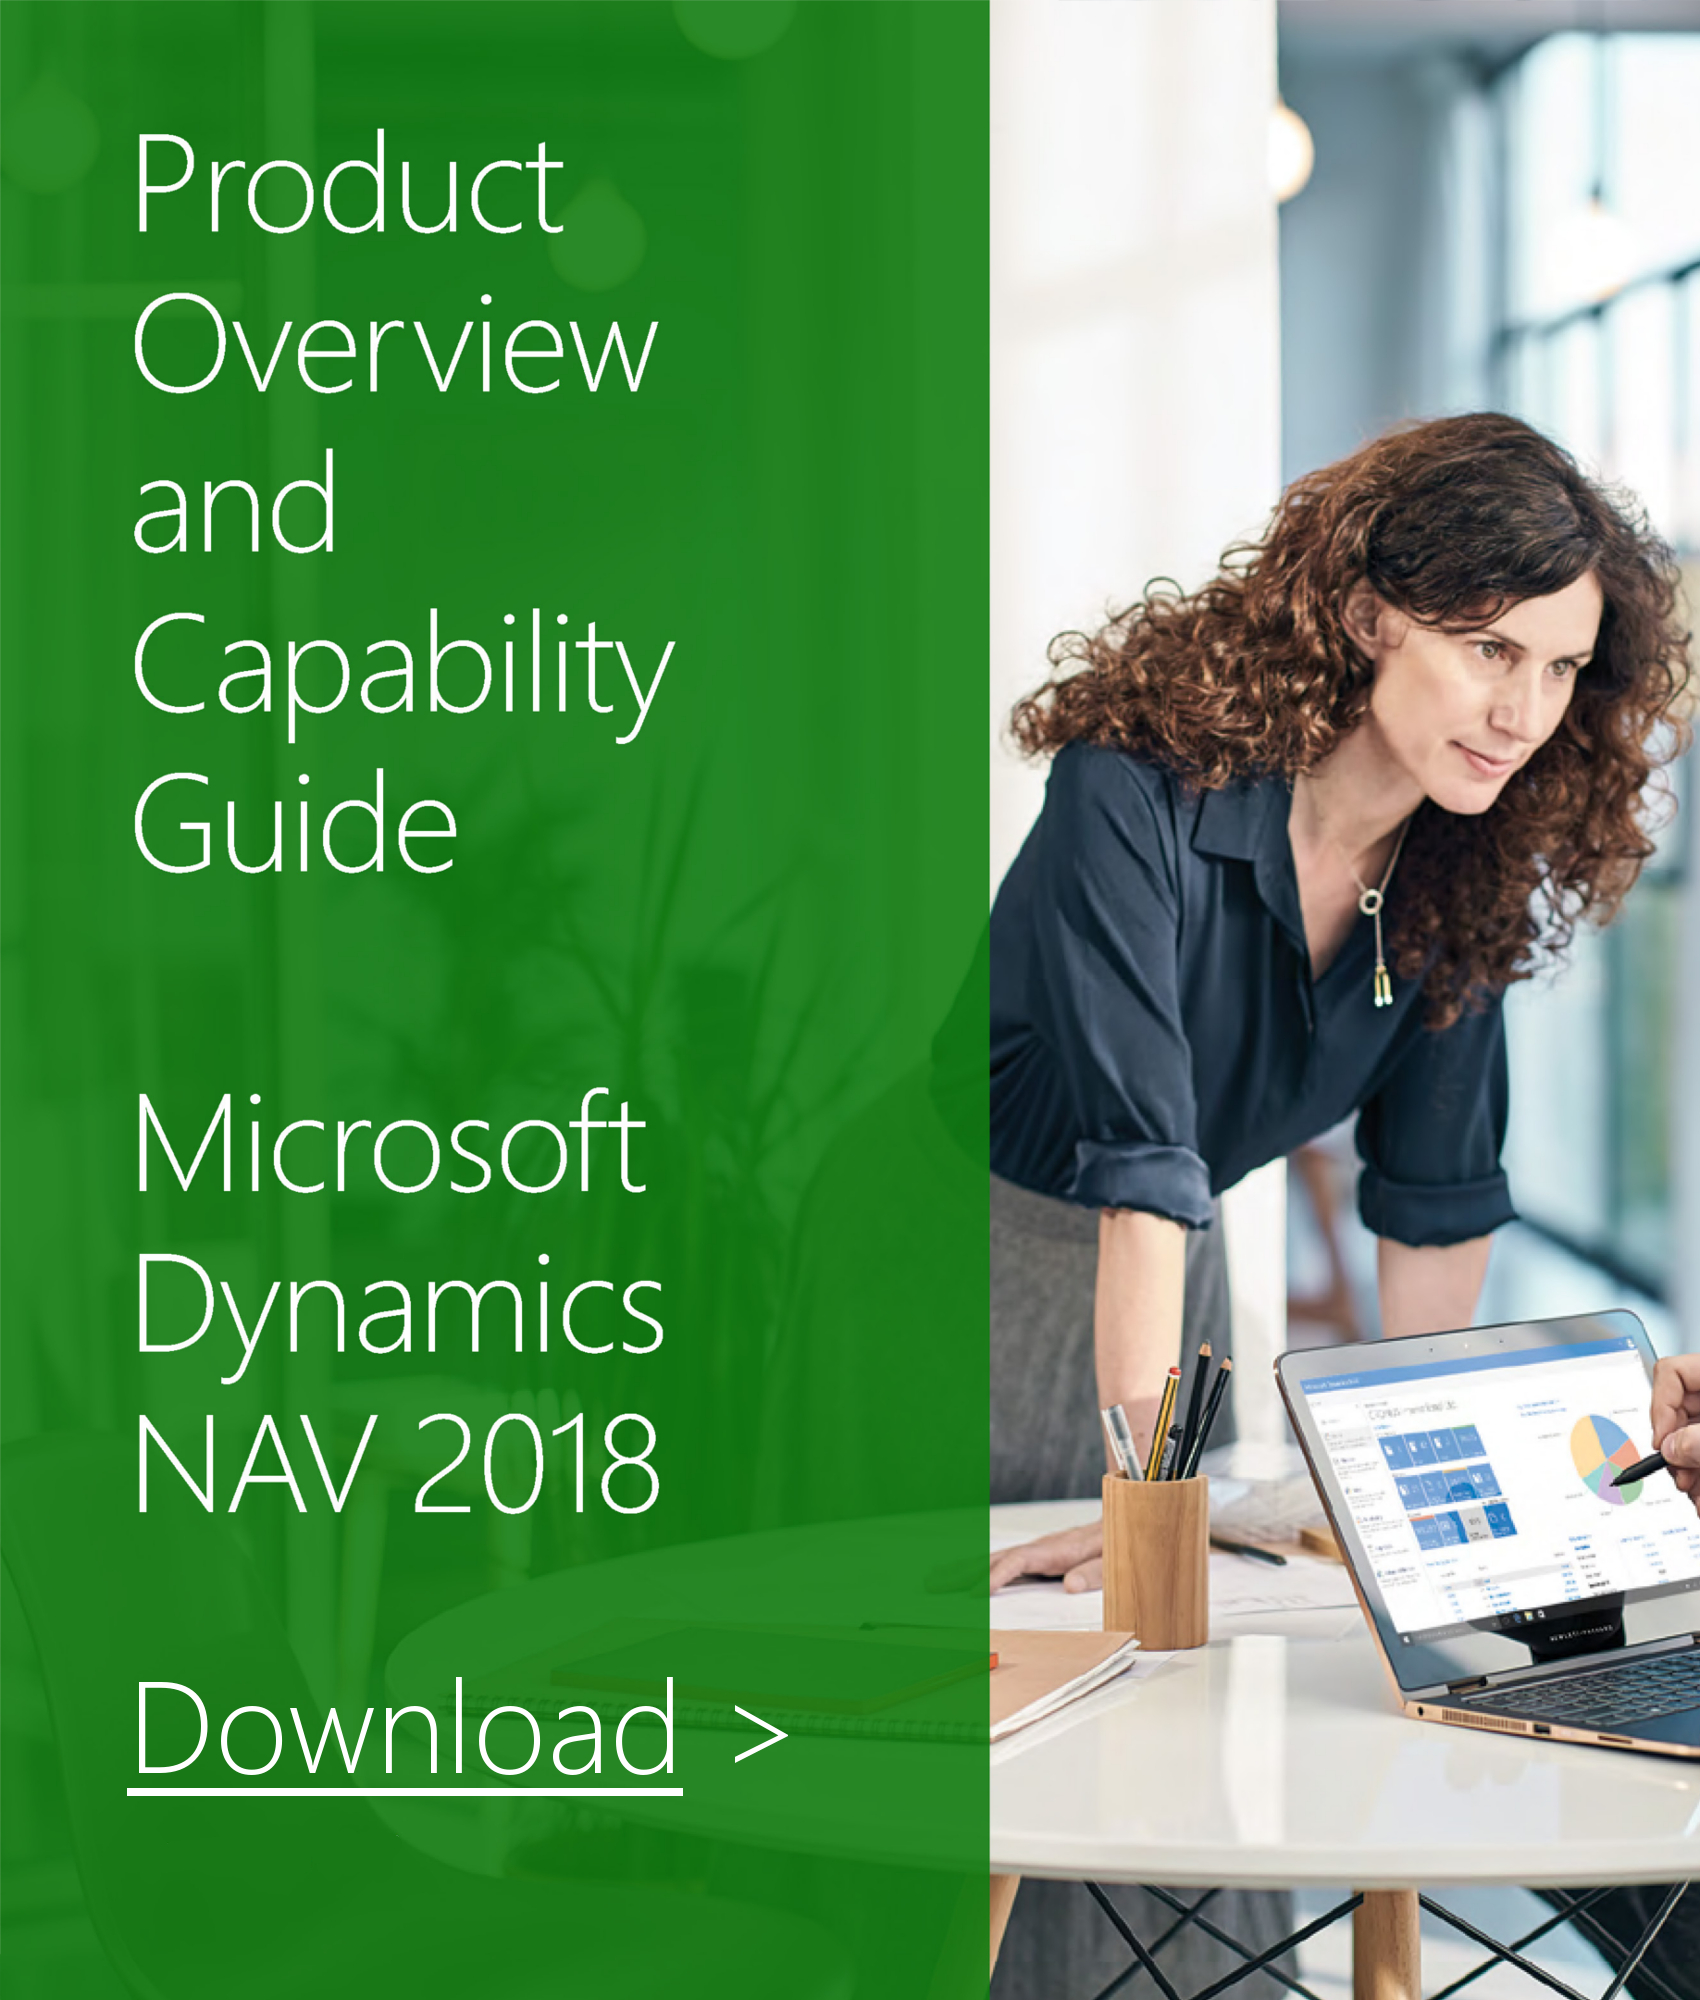 Dynamics NAV 2018 Capability Guide